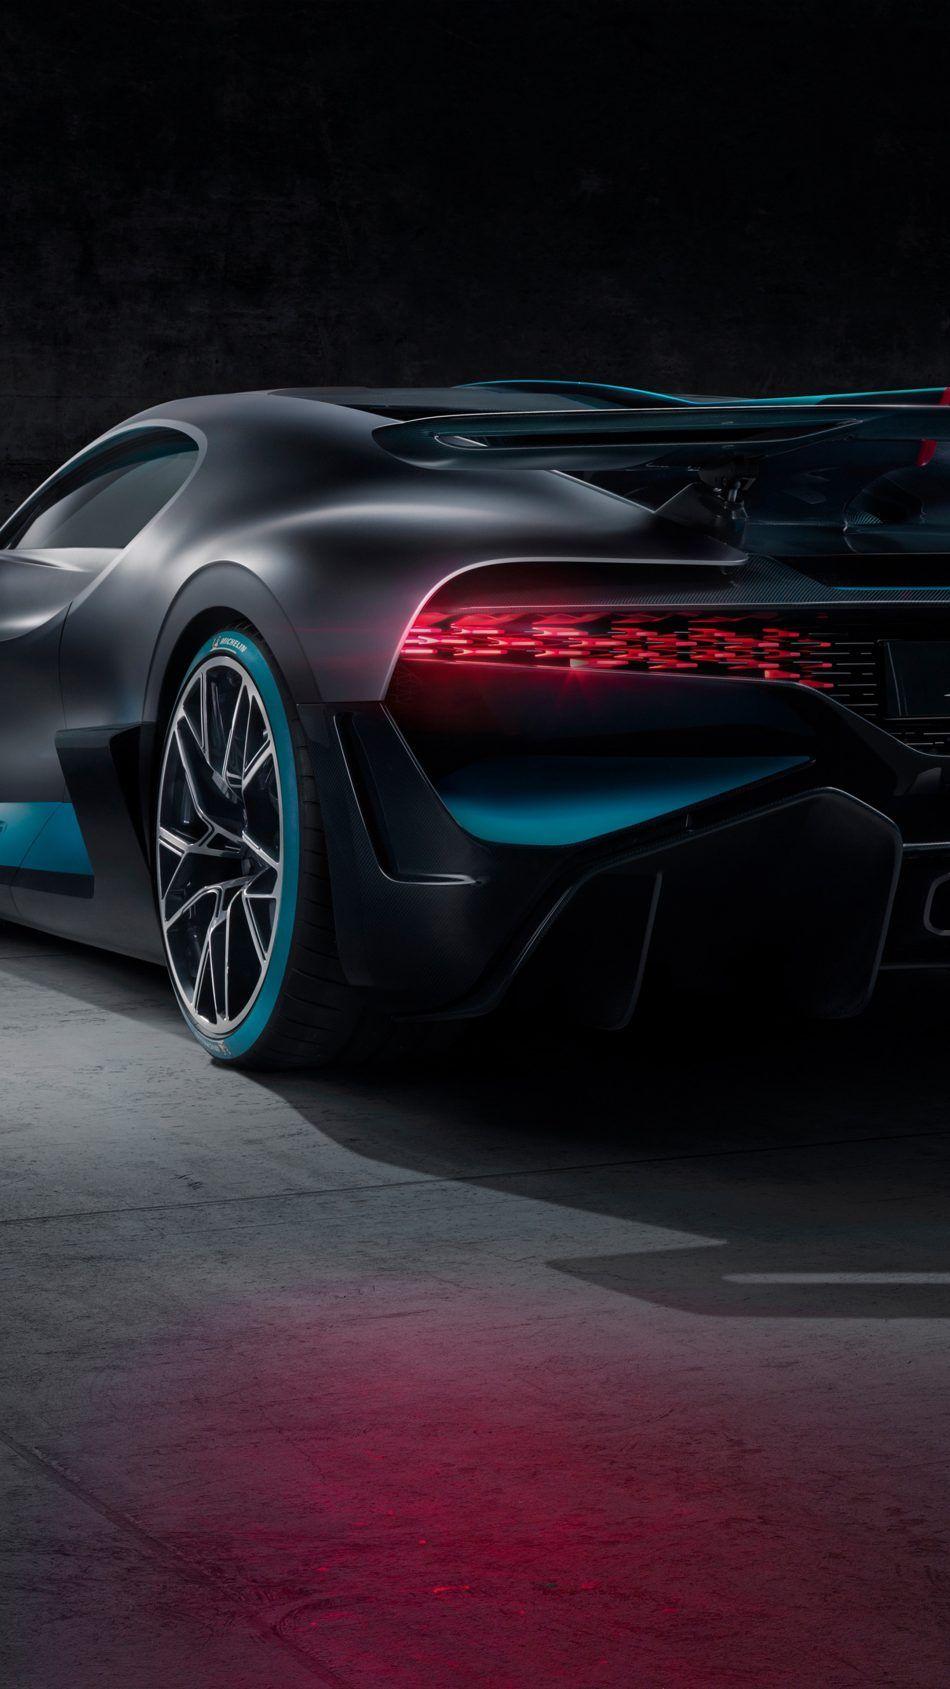 Ultra Hd Sports Car Wallpaper Hd For Mobile